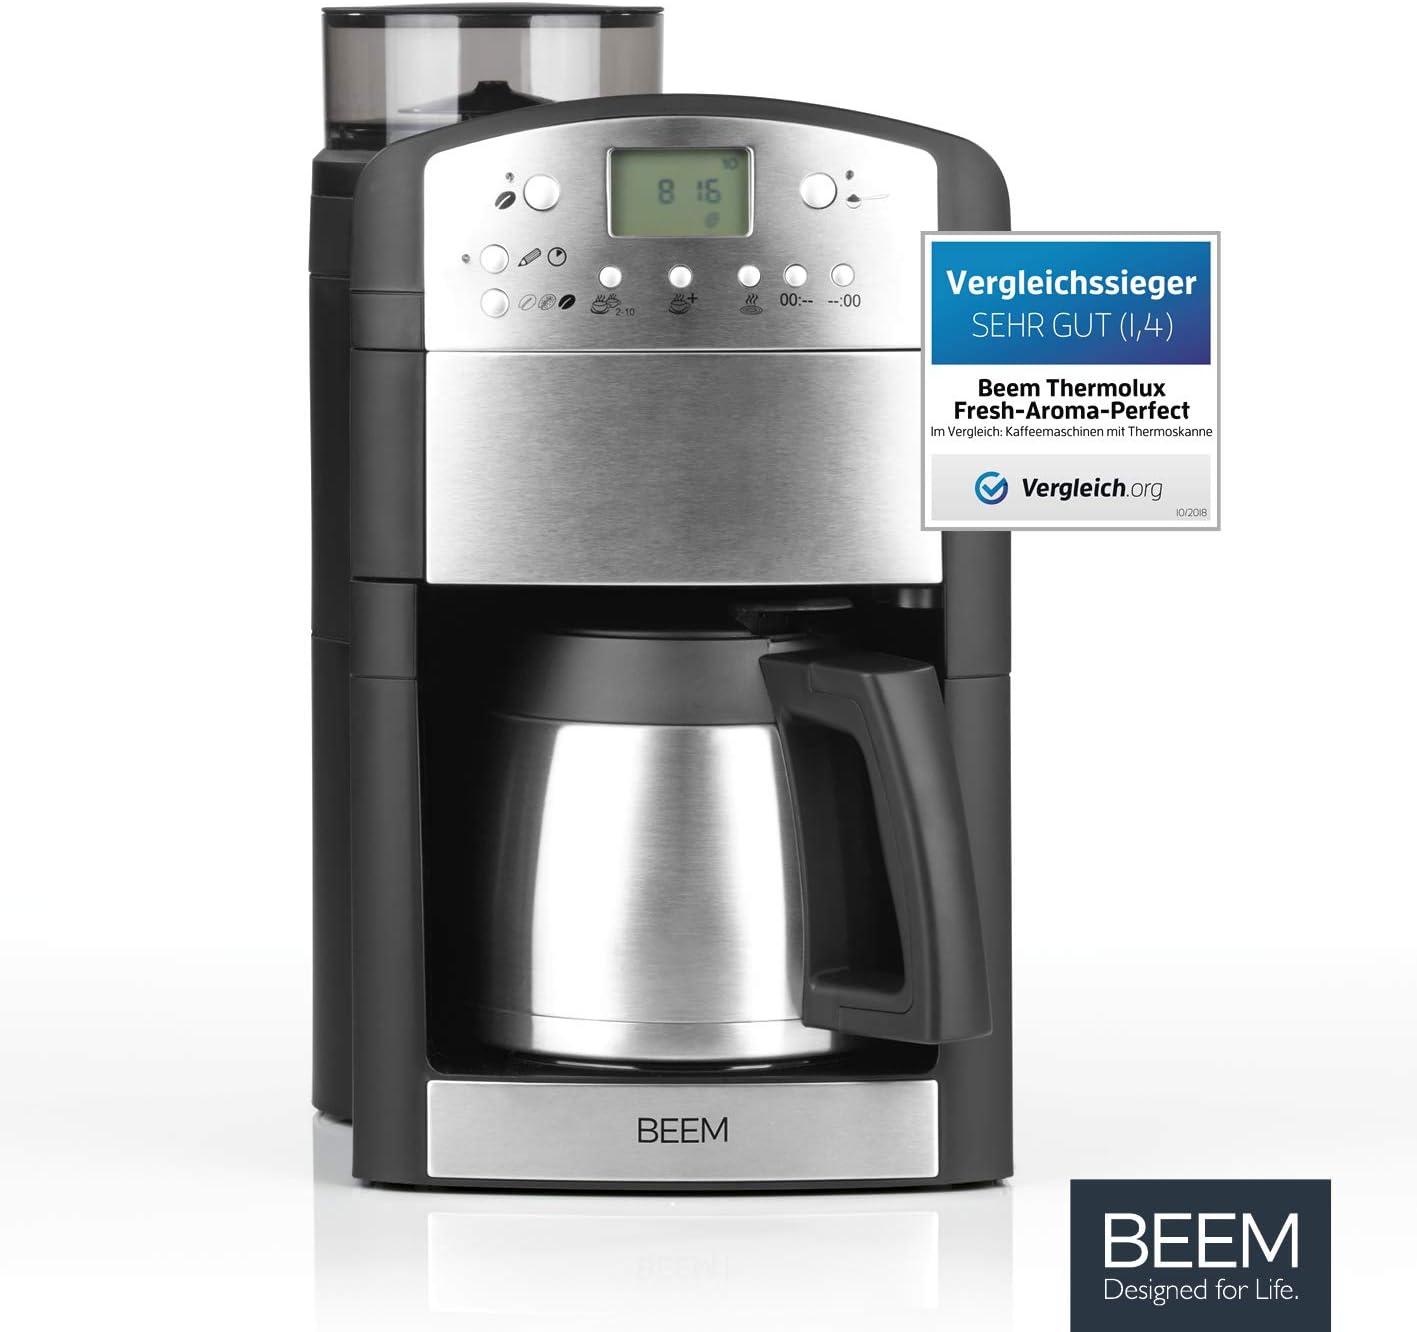 BEEM Germany Fresh-Aroma-Perfect Thermolux - Máquina de café: Amazon.es: Hogar